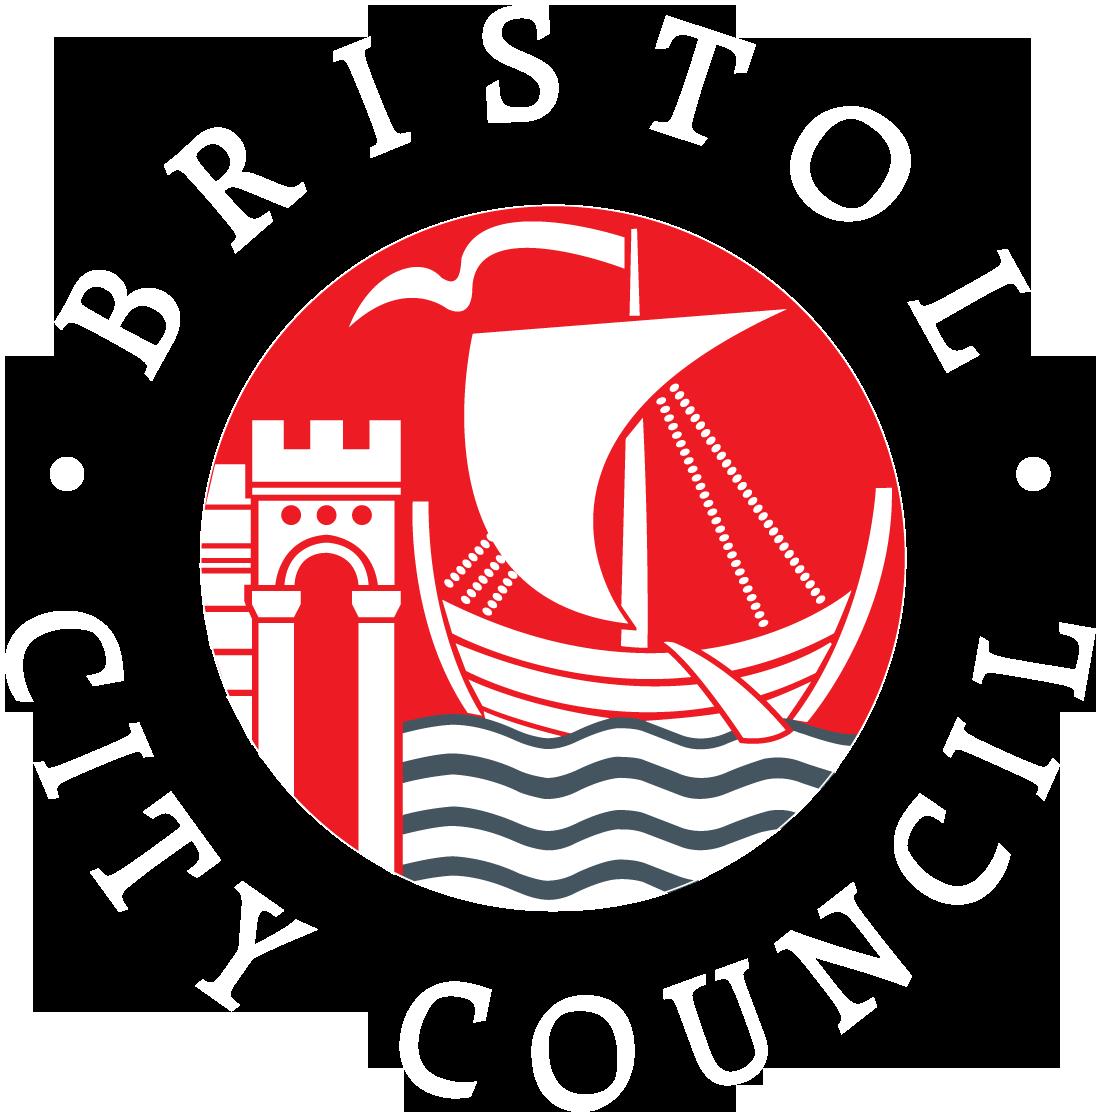 Bristol Council